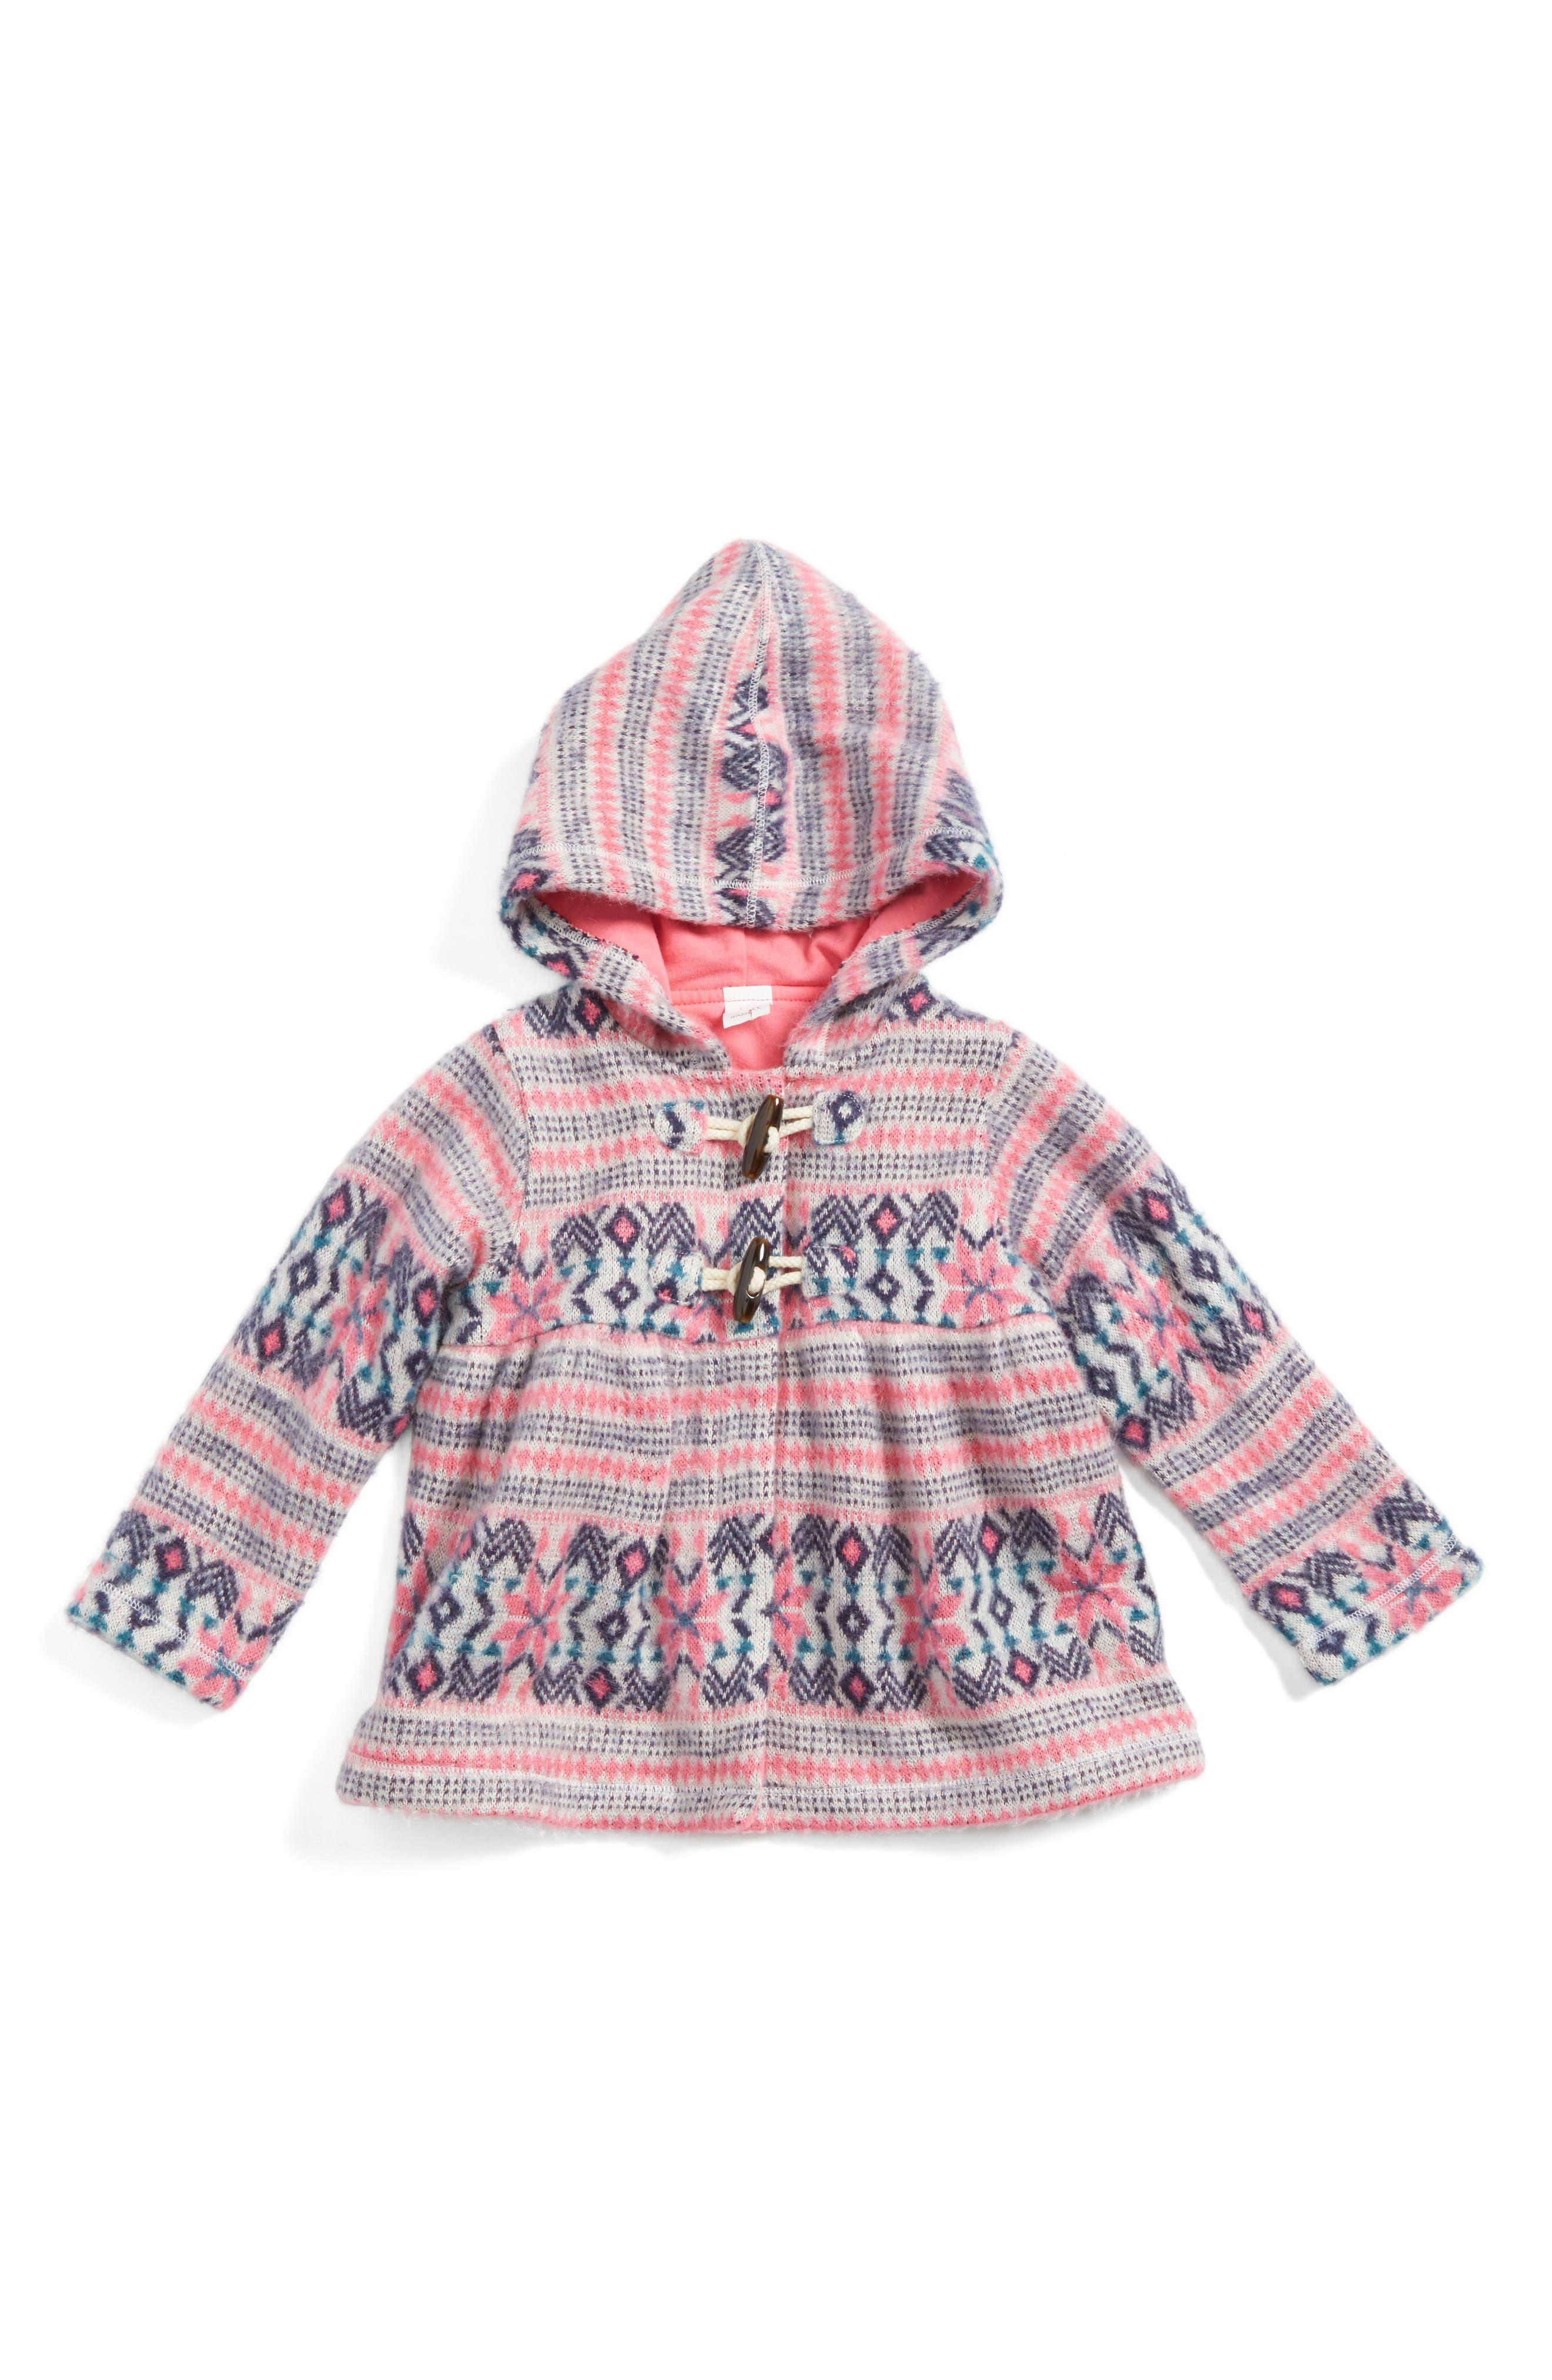 Fair Isle Hooded Jacket,                             Main thumbnail 1, color,                             Ivory Egret- Pink Fairisle